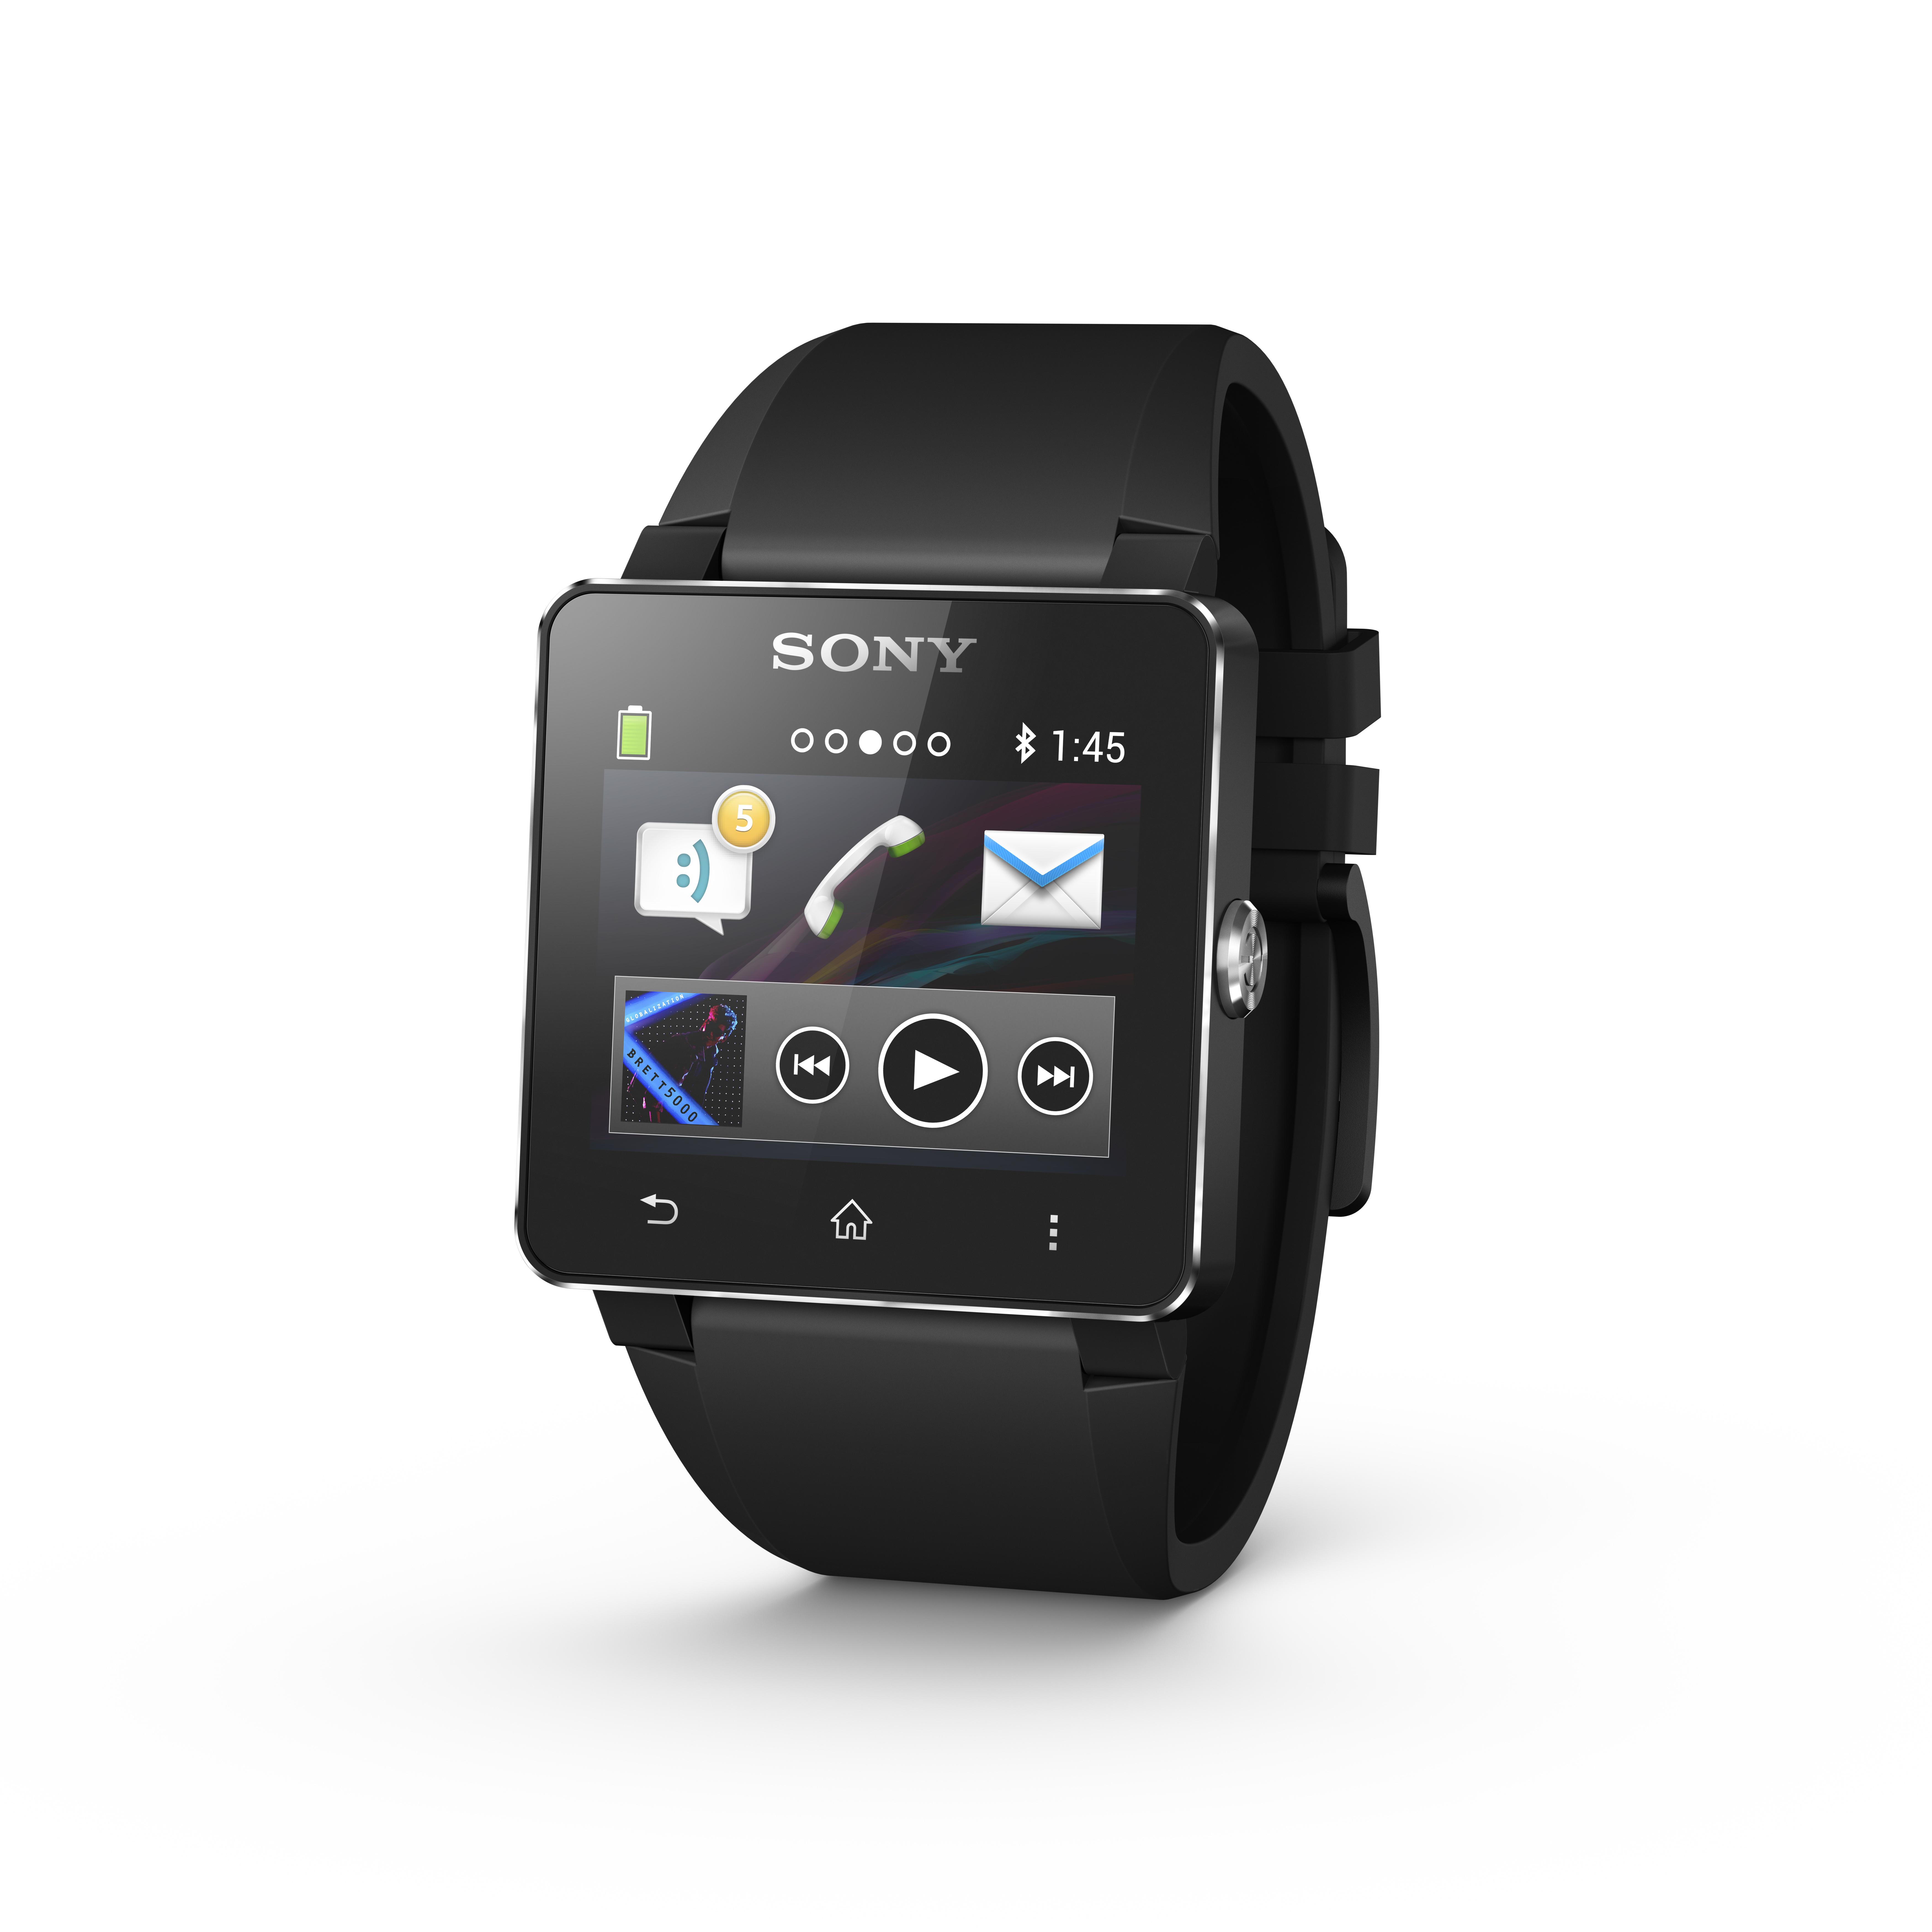 1_Smartwatch_2_Black_Angled